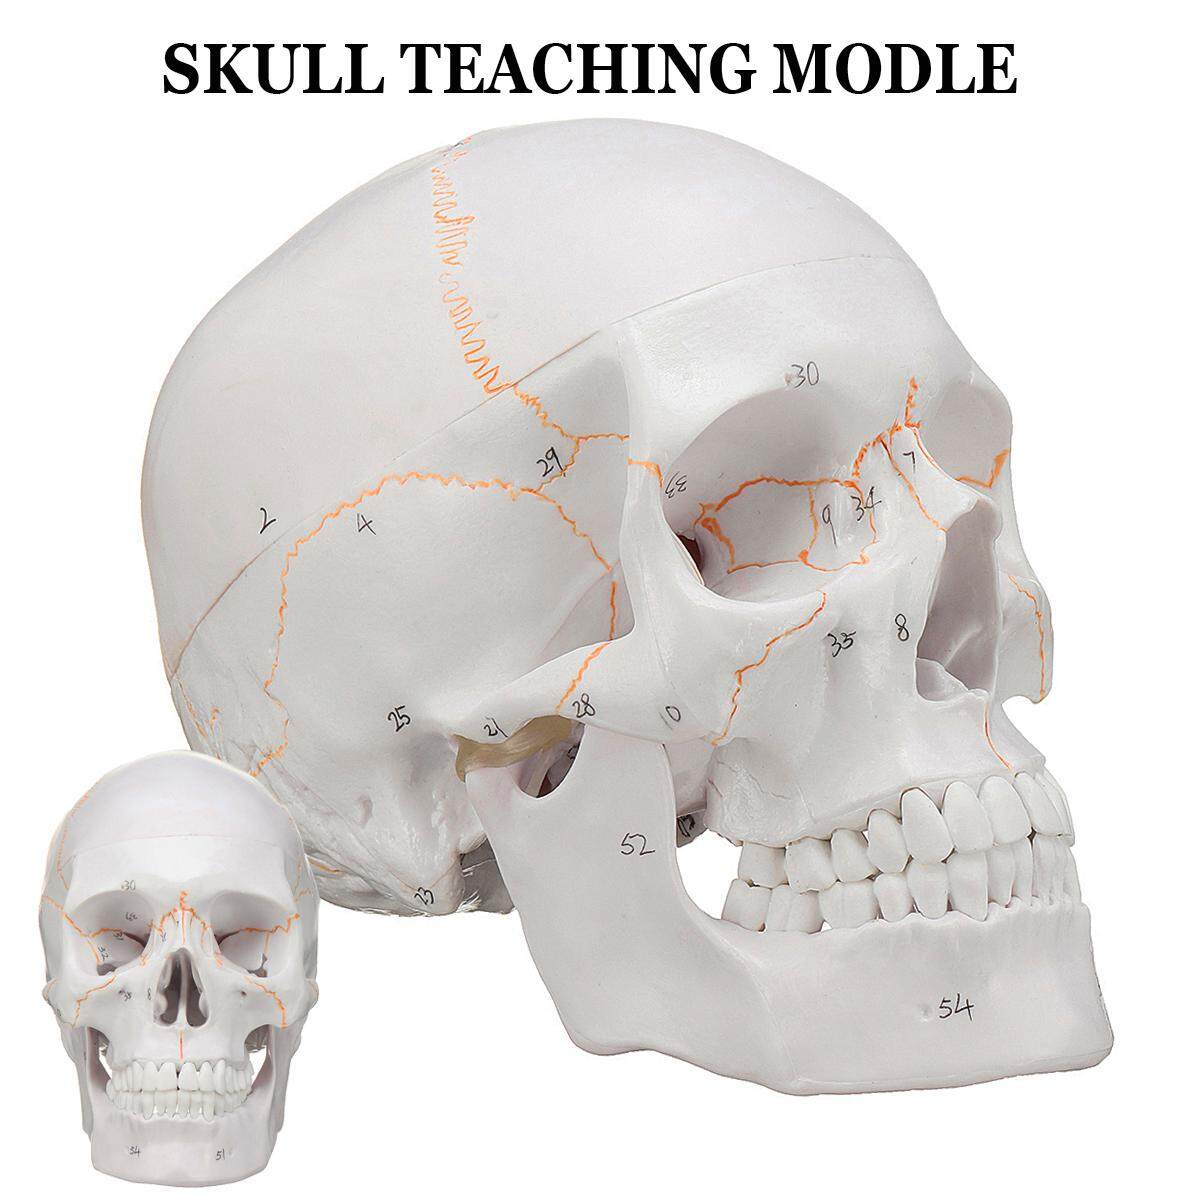 Life Size Human Anatomical Anatomy Head Skeleton Skull Teaching Model  Precise